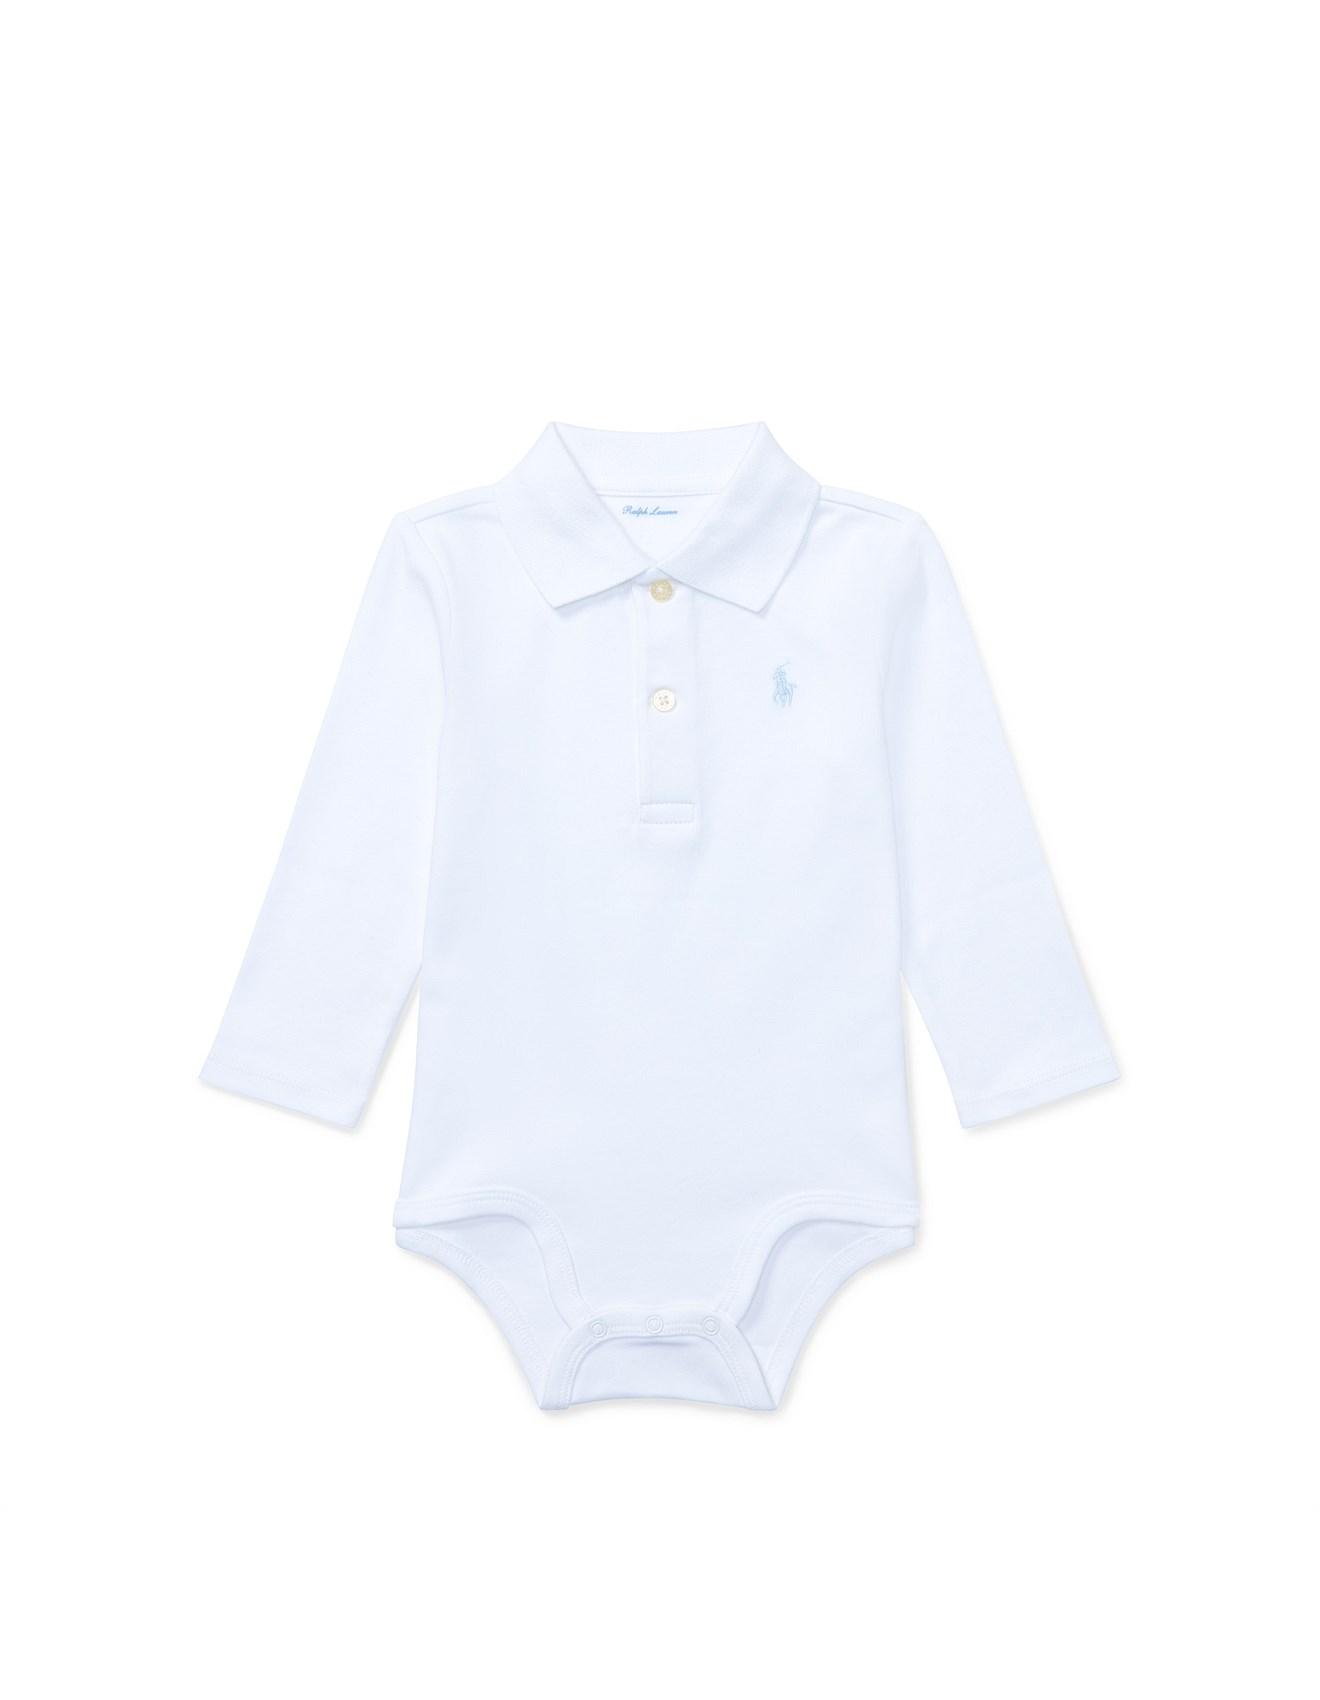 9abcdf181764 Baby Boy Clothing Sale